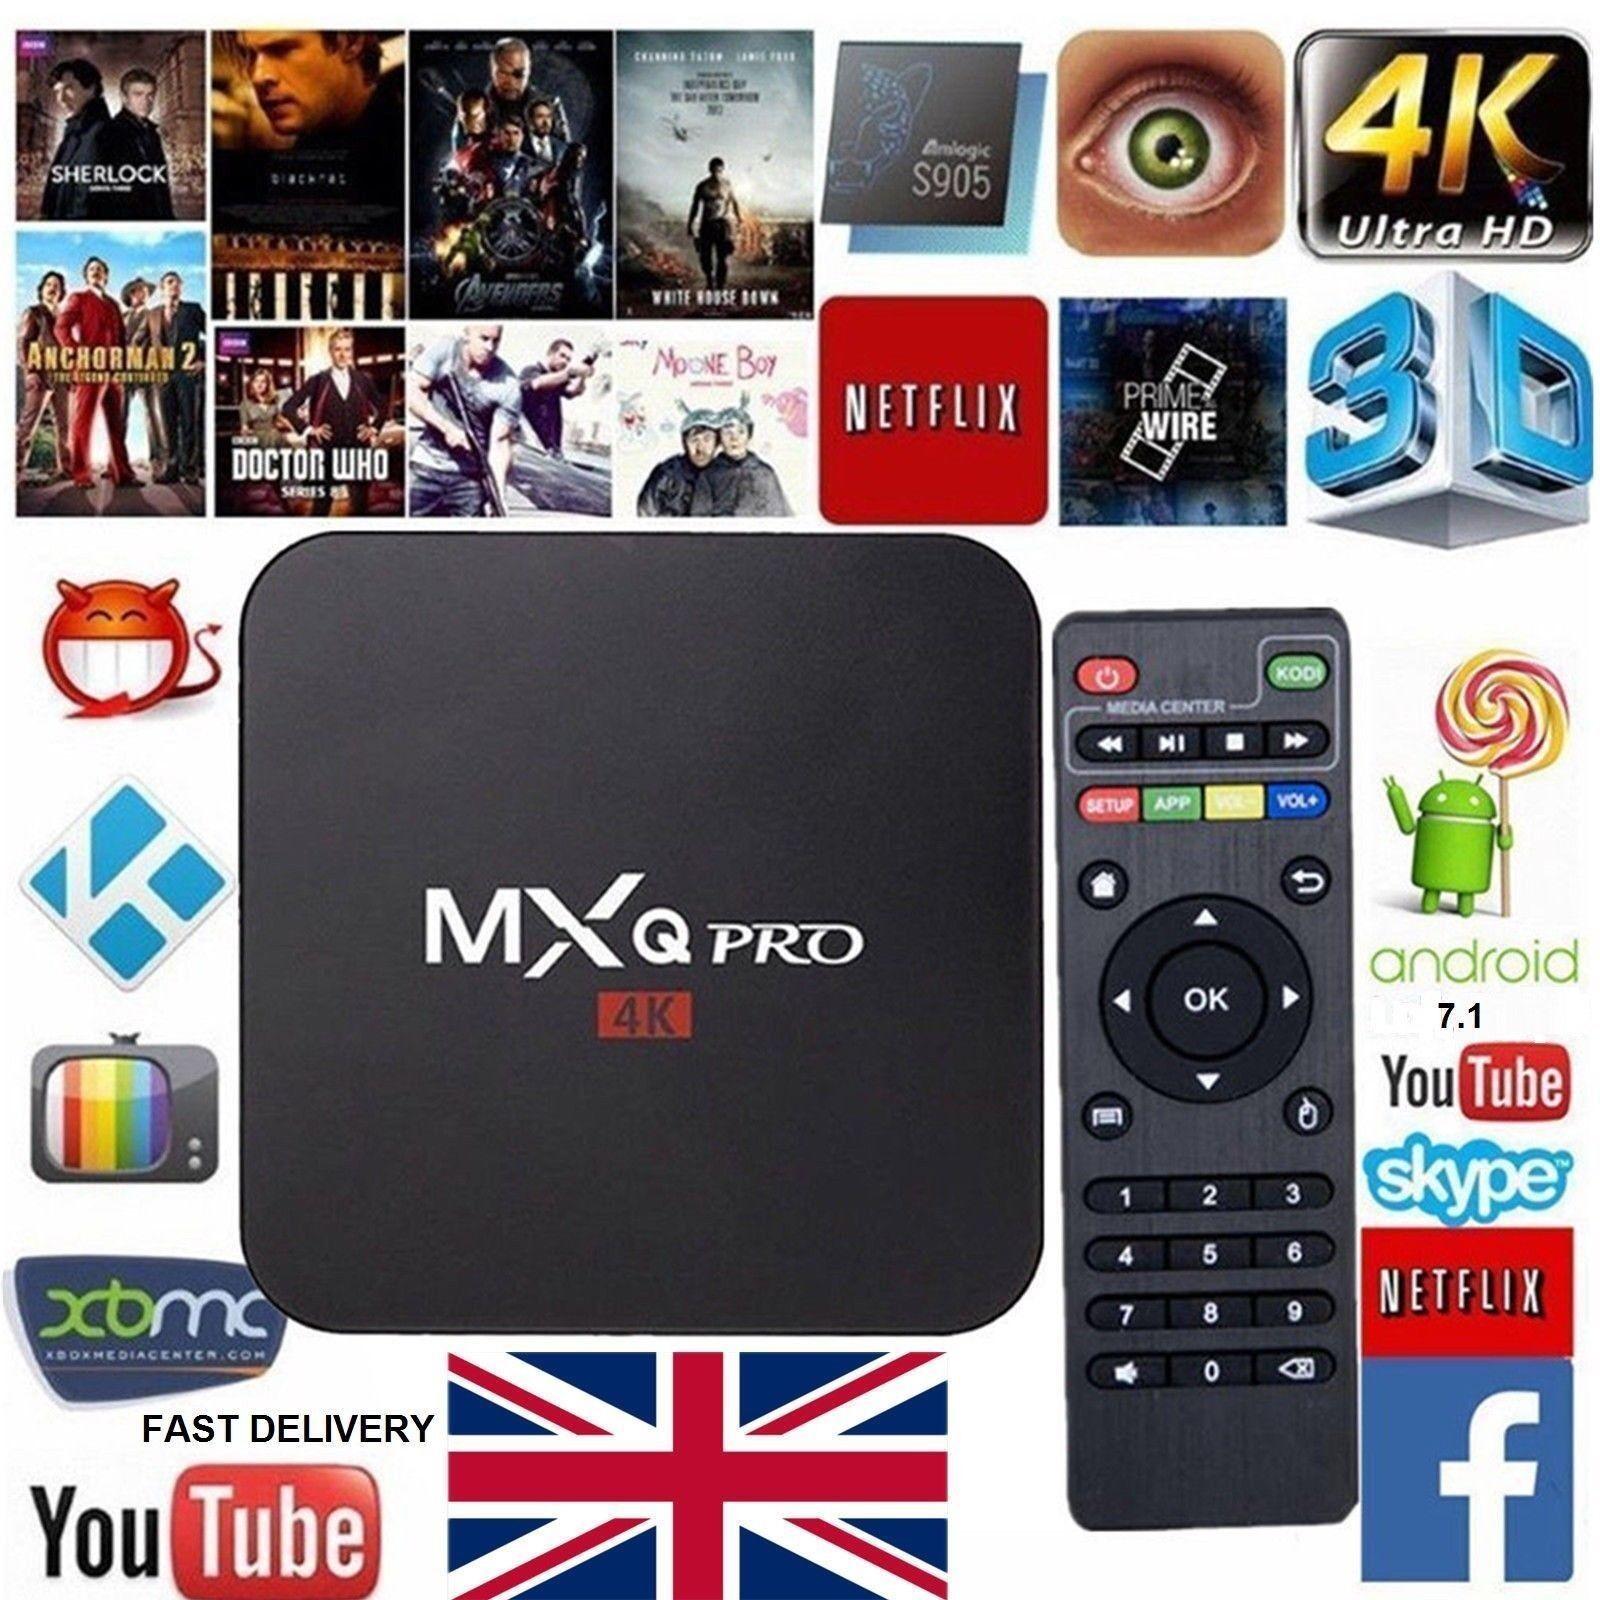 Mxq Pro 4k Recovery Mode